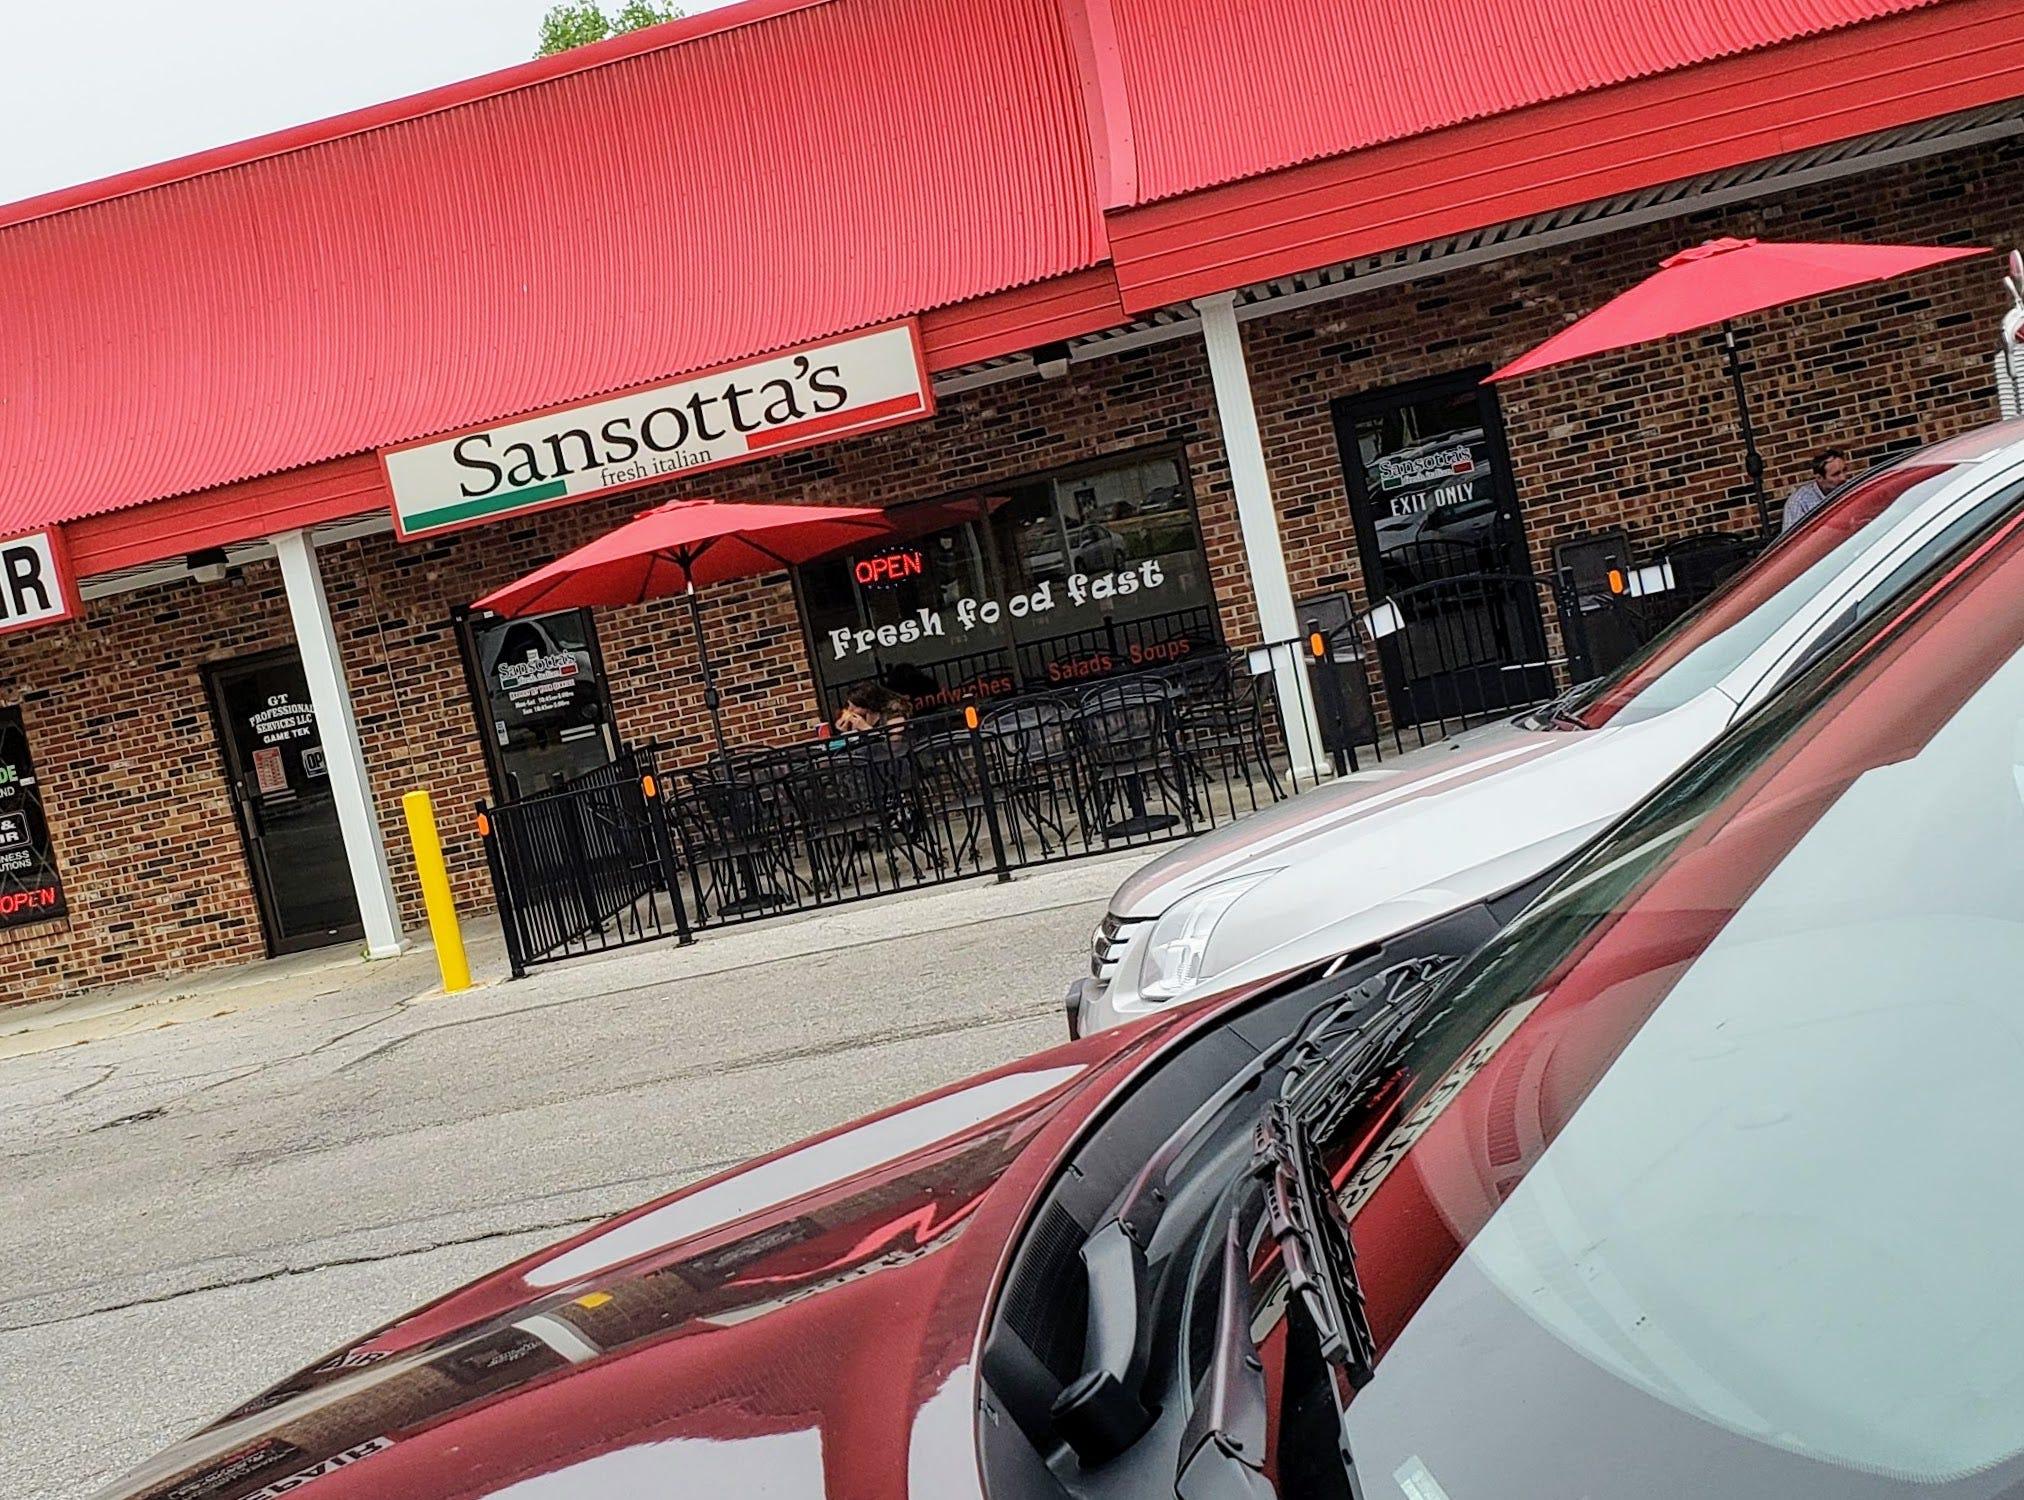 Sansotta's storefront.